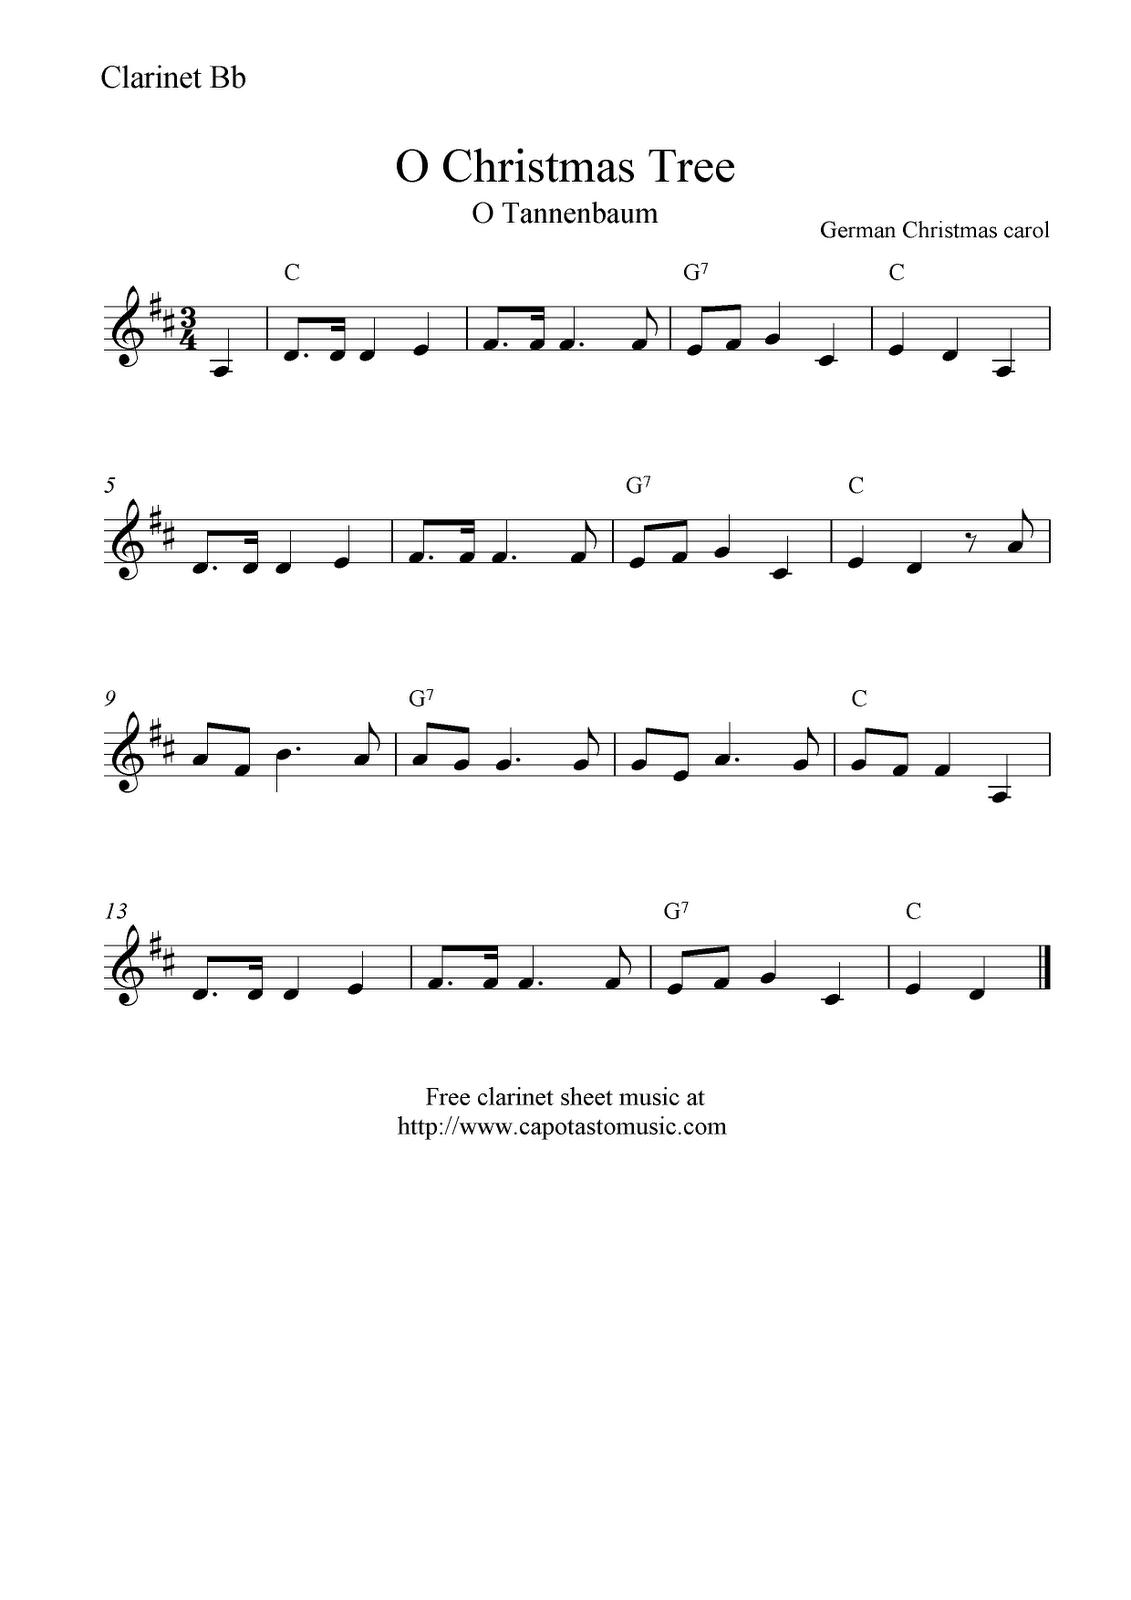 Free Sheet Music Scores: O Christmas Tree (O Tannenbaum), Free - Free Printable Clarinet Music